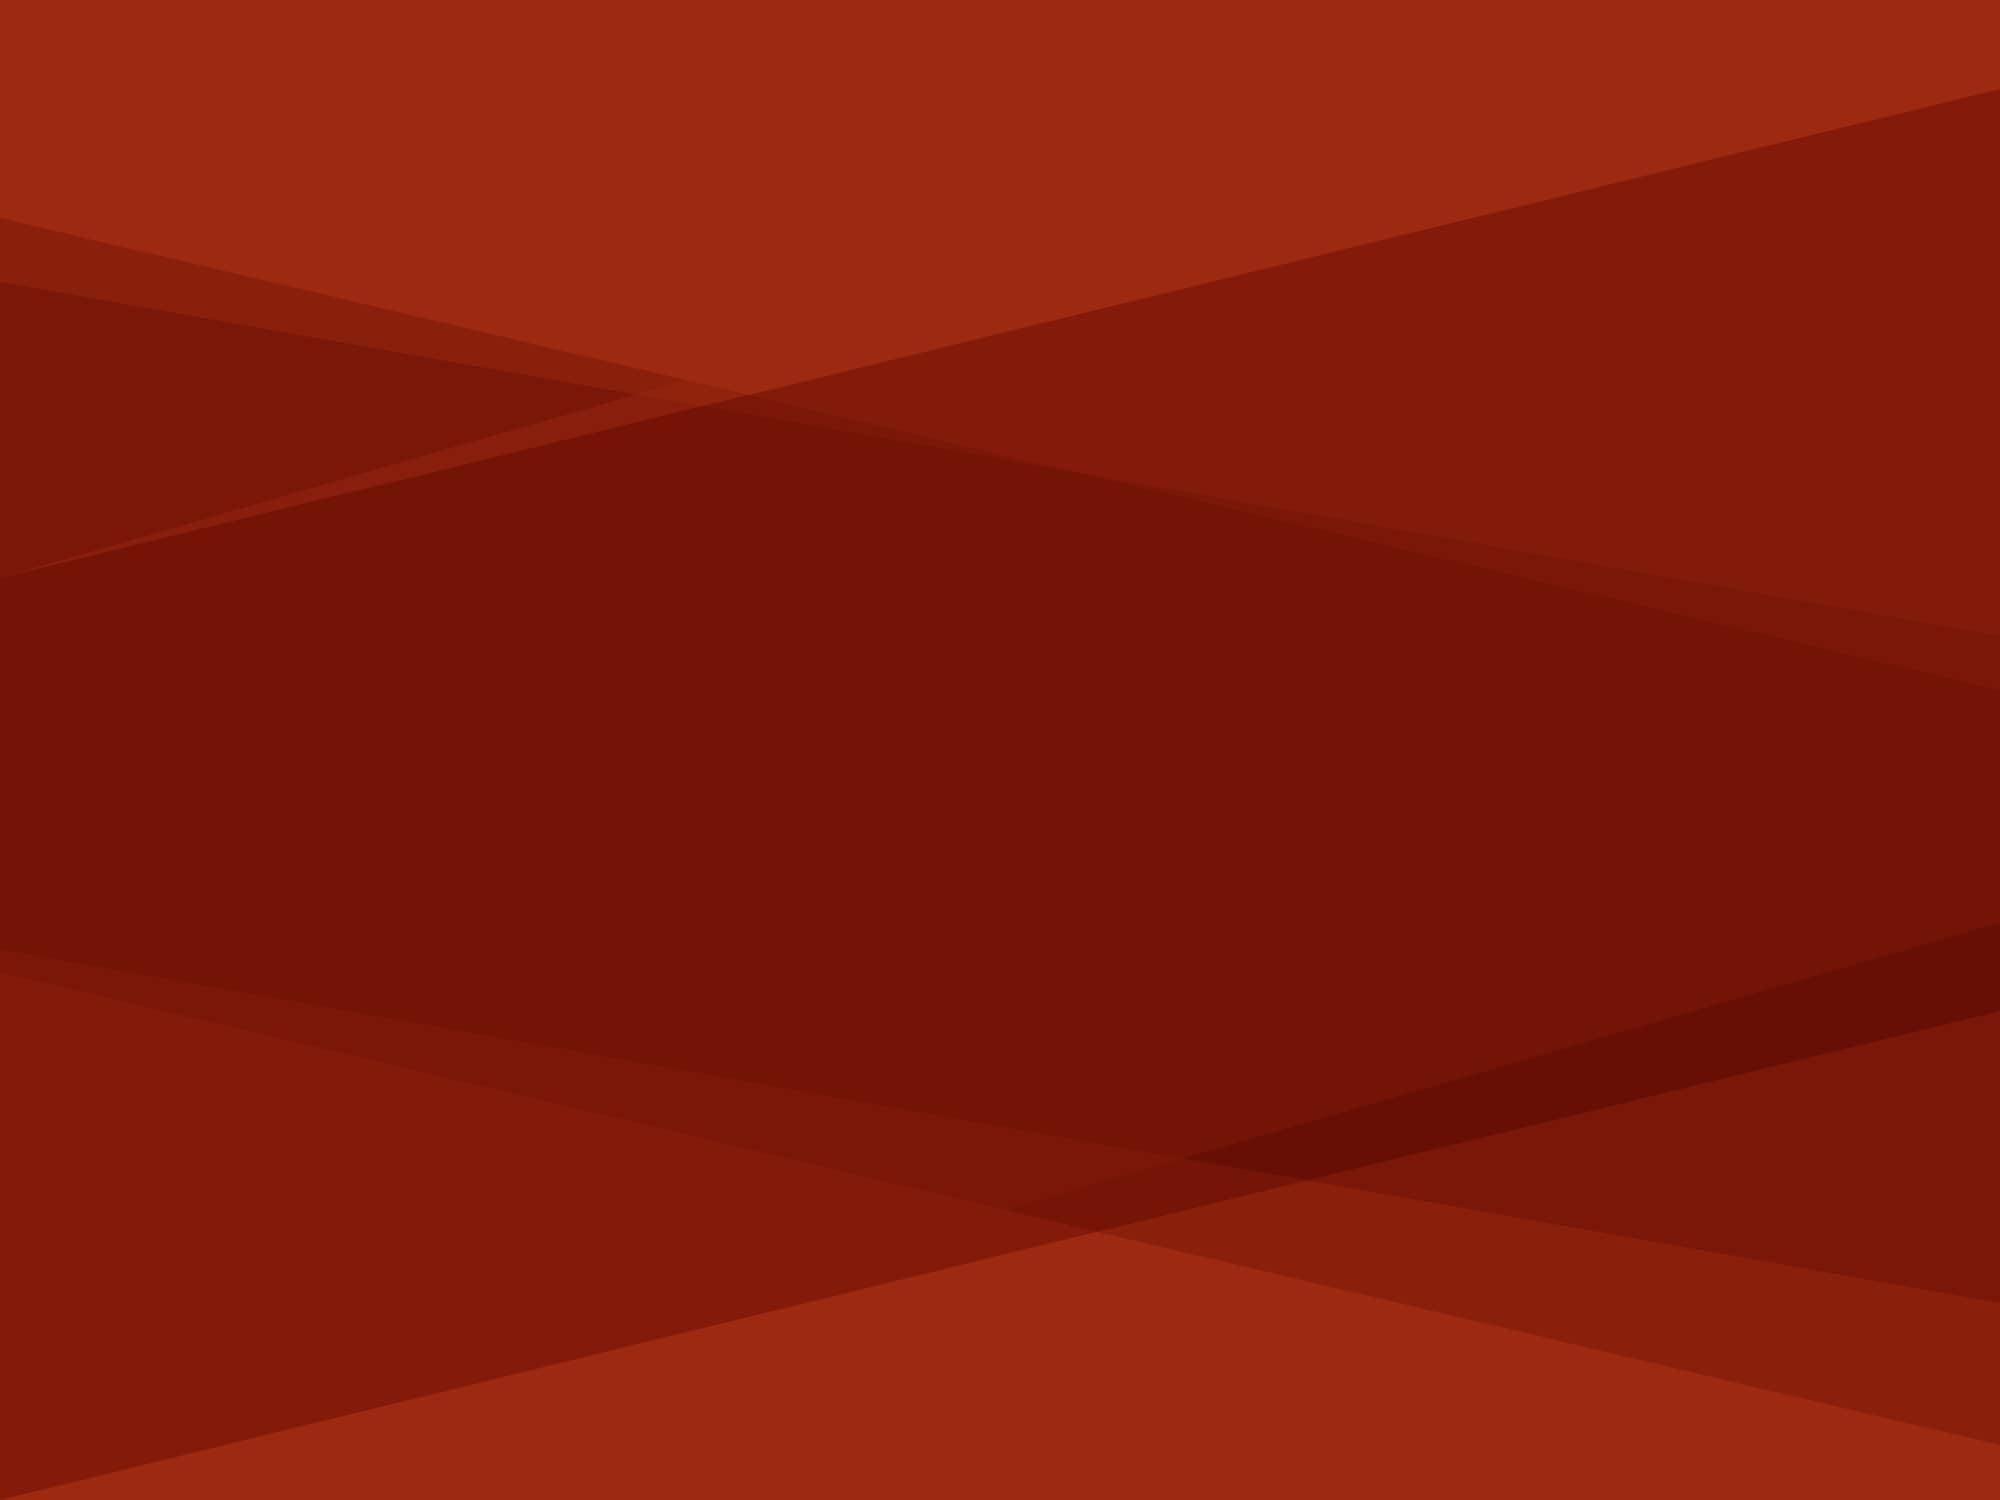 Diagonal screens texture red